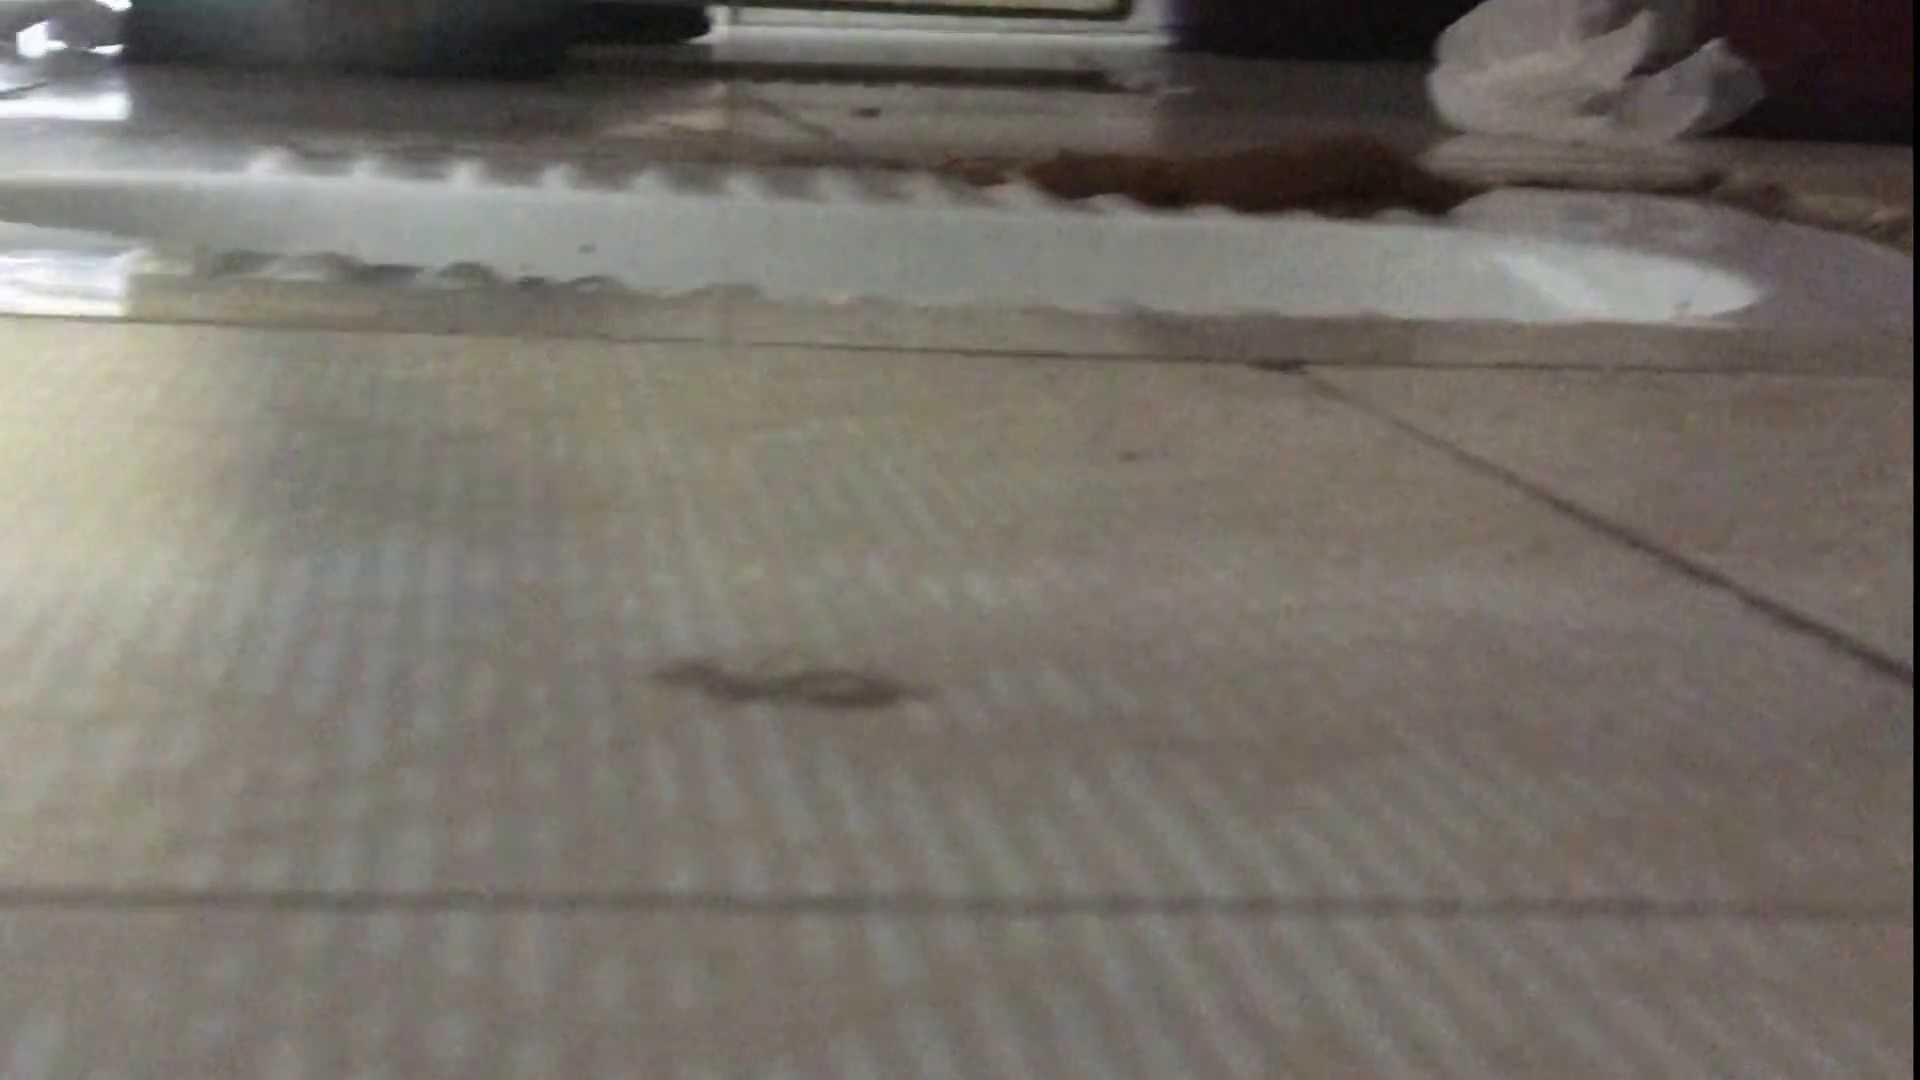 芸術大学ガチ潜入盗撮 JD盗撮 美女の洗面所の秘密 Vol.107 トイレ中の女子達   盗撮映像大放出  83連発 55